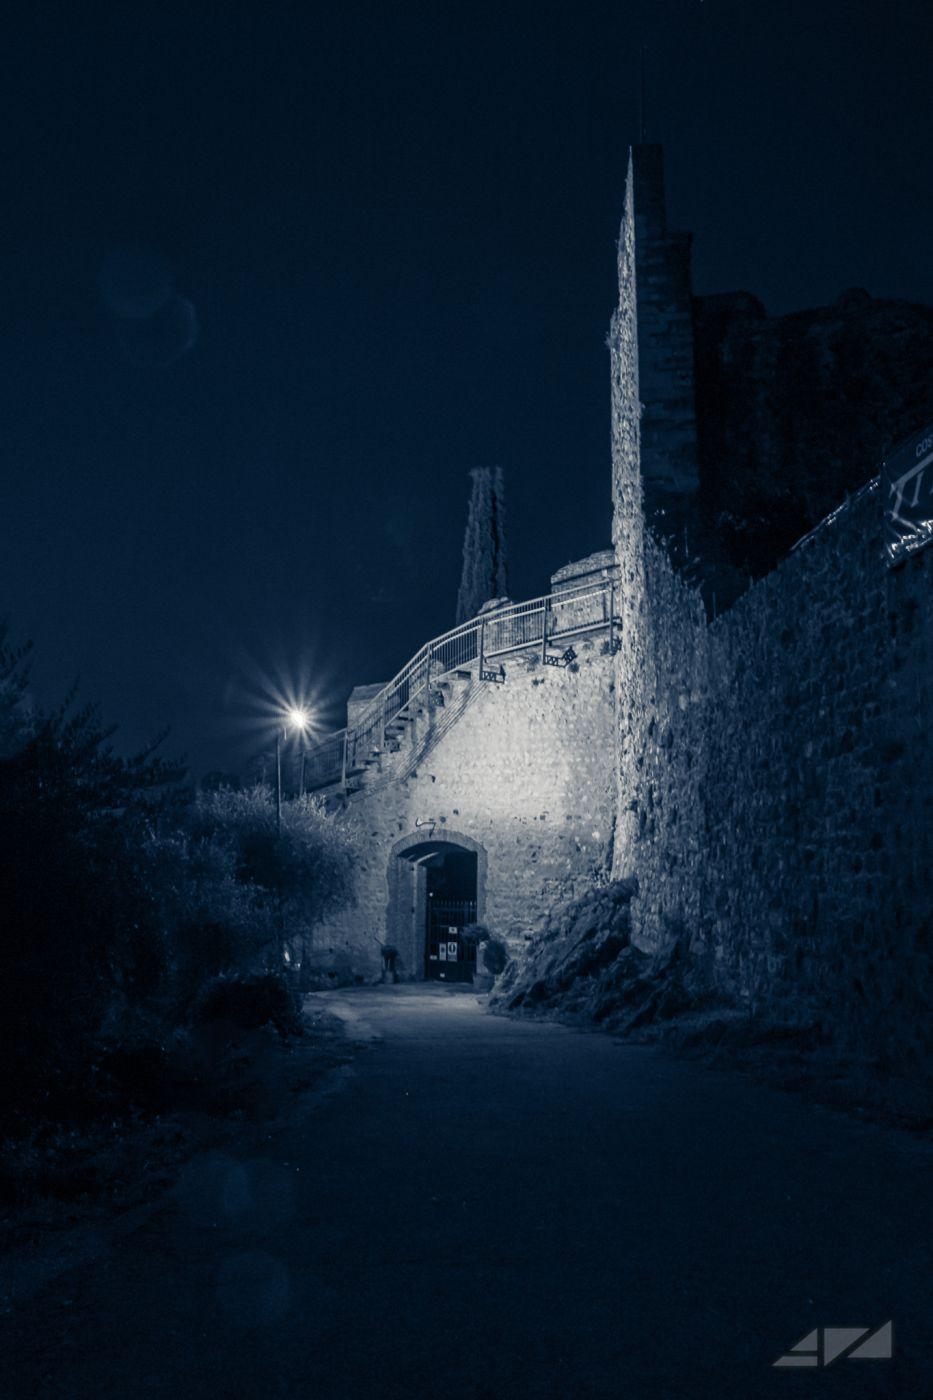 Castello superiore Marostica, Italy